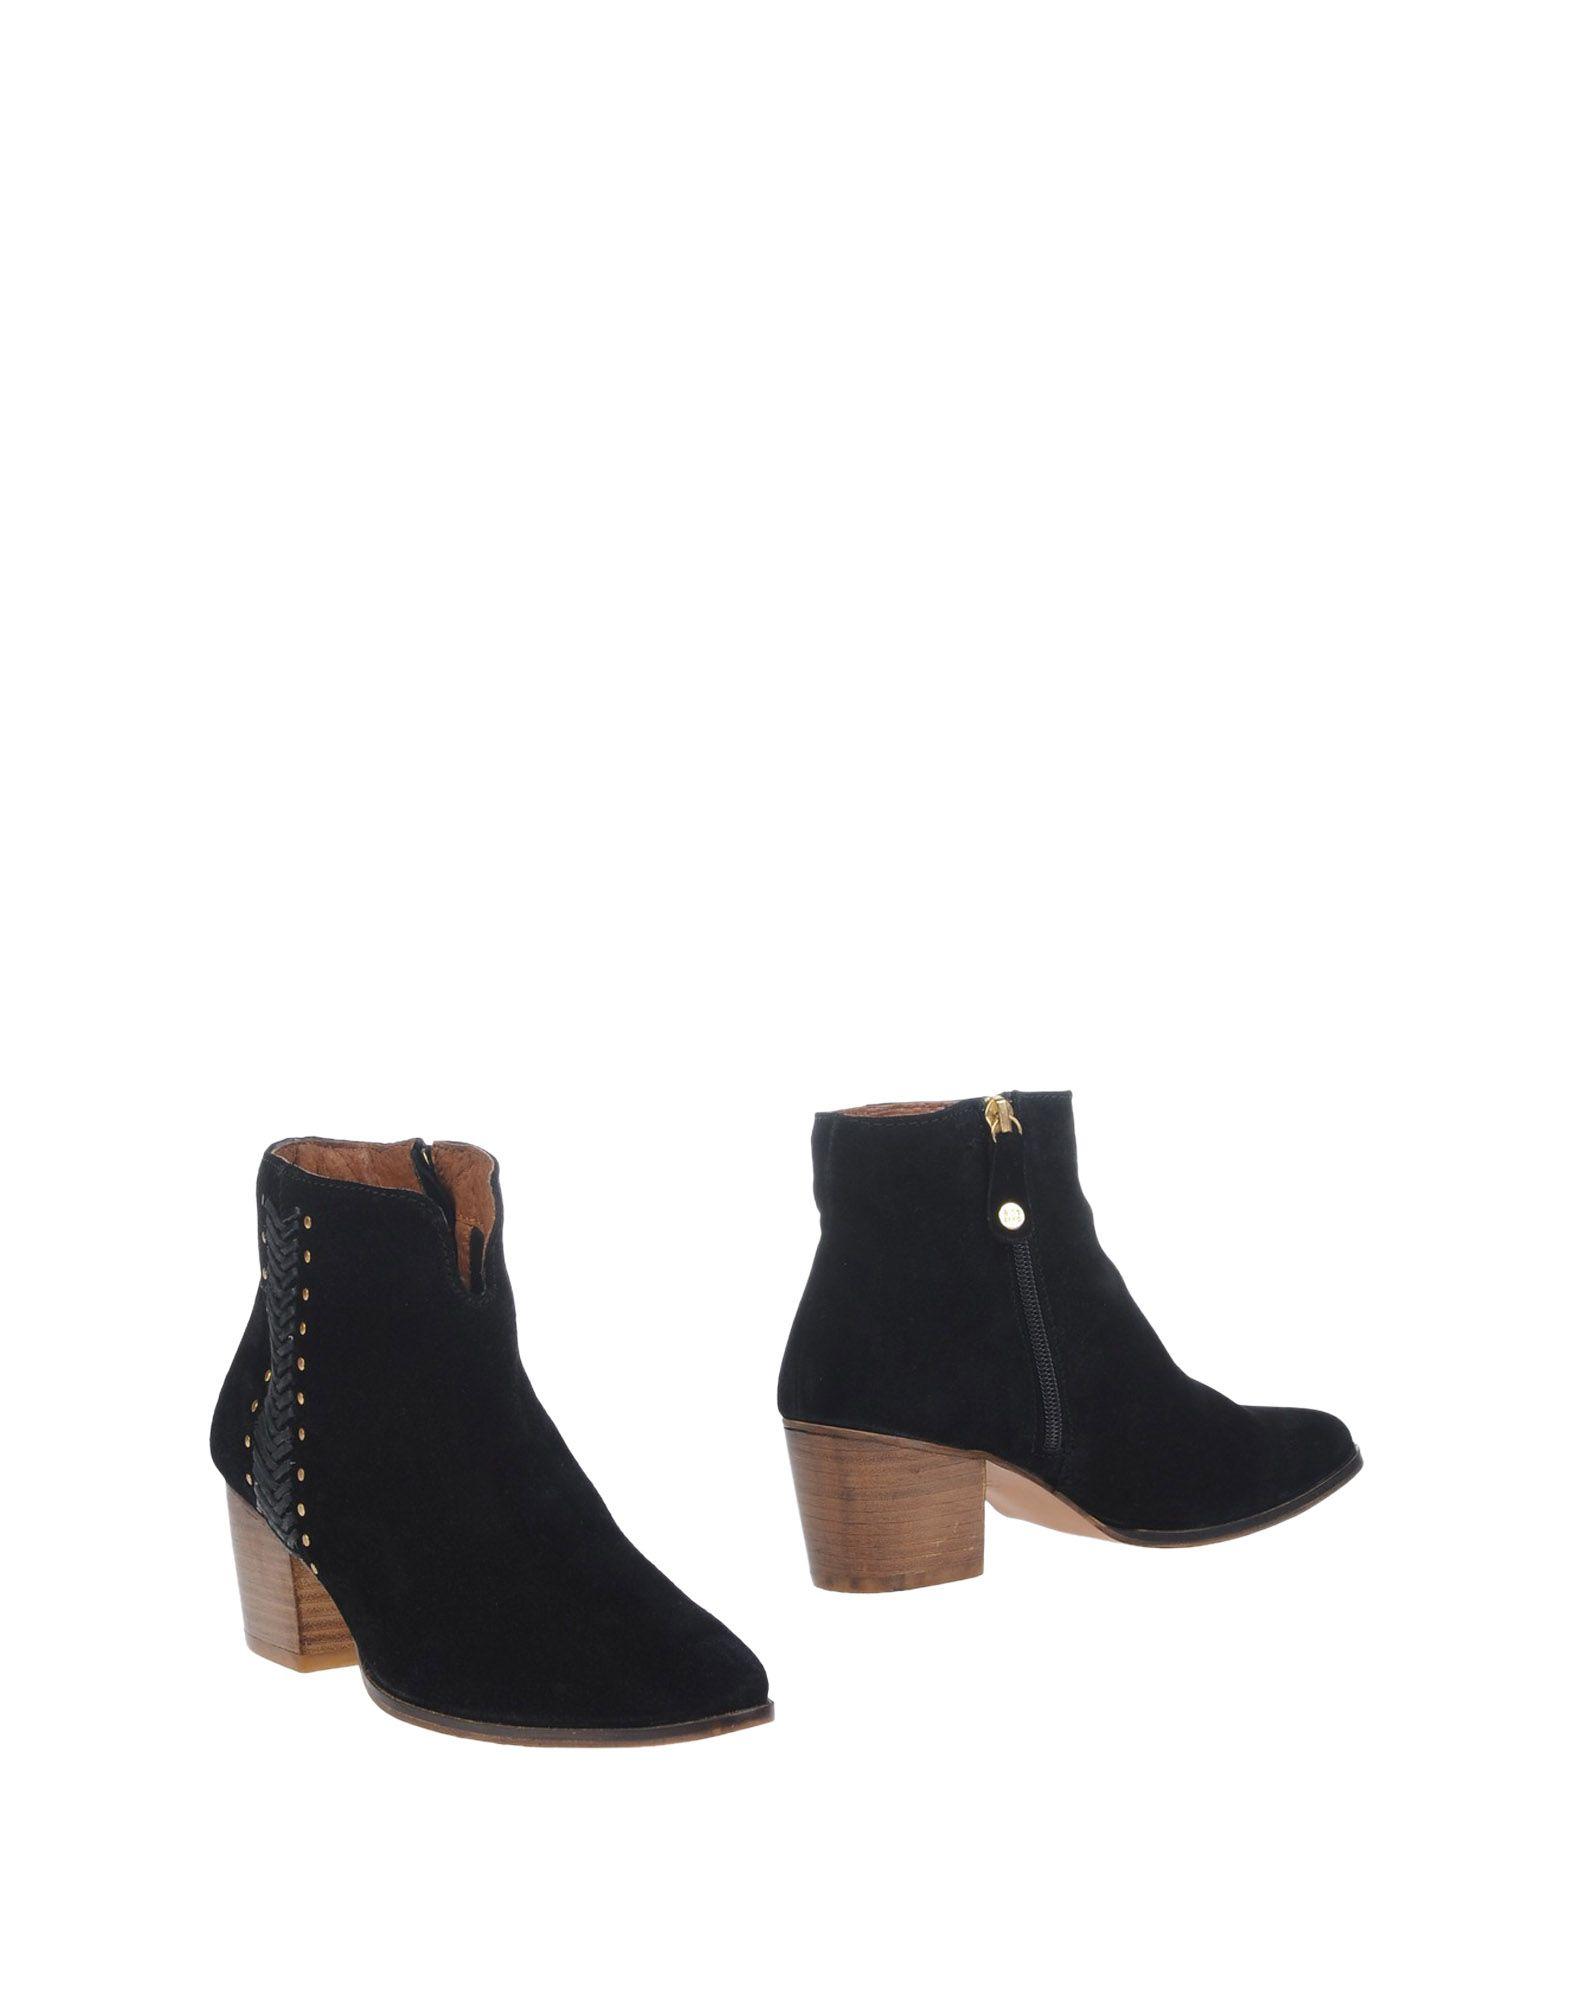 Gioseppo Stiefelette Damen  11223408DI Gute Qualität beliebte Schuhe